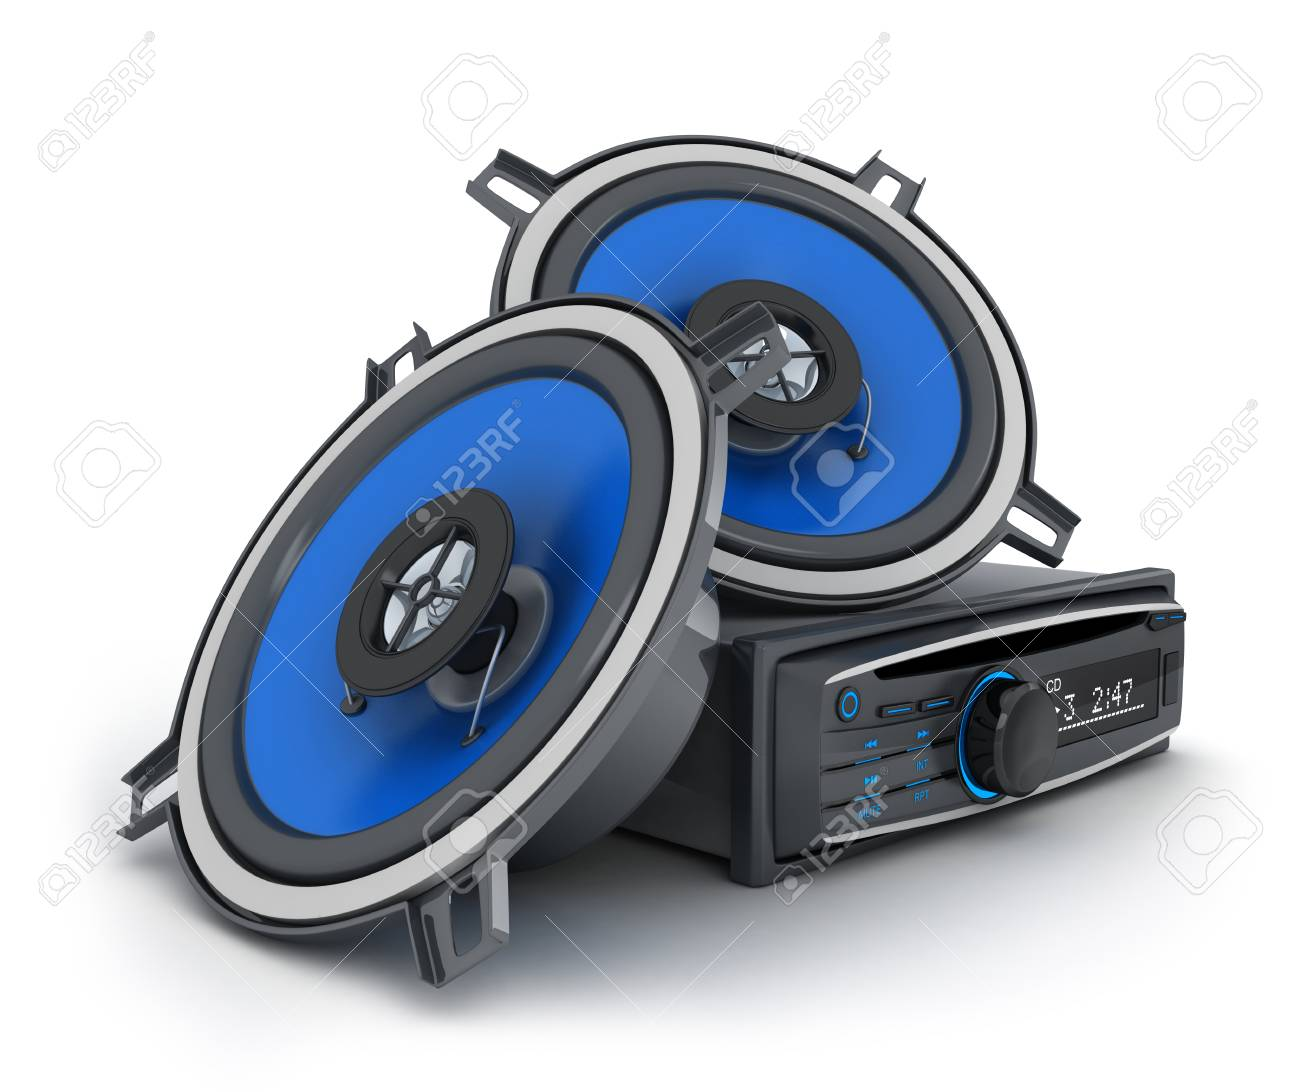 Audio system car 3d illustration - 52407811